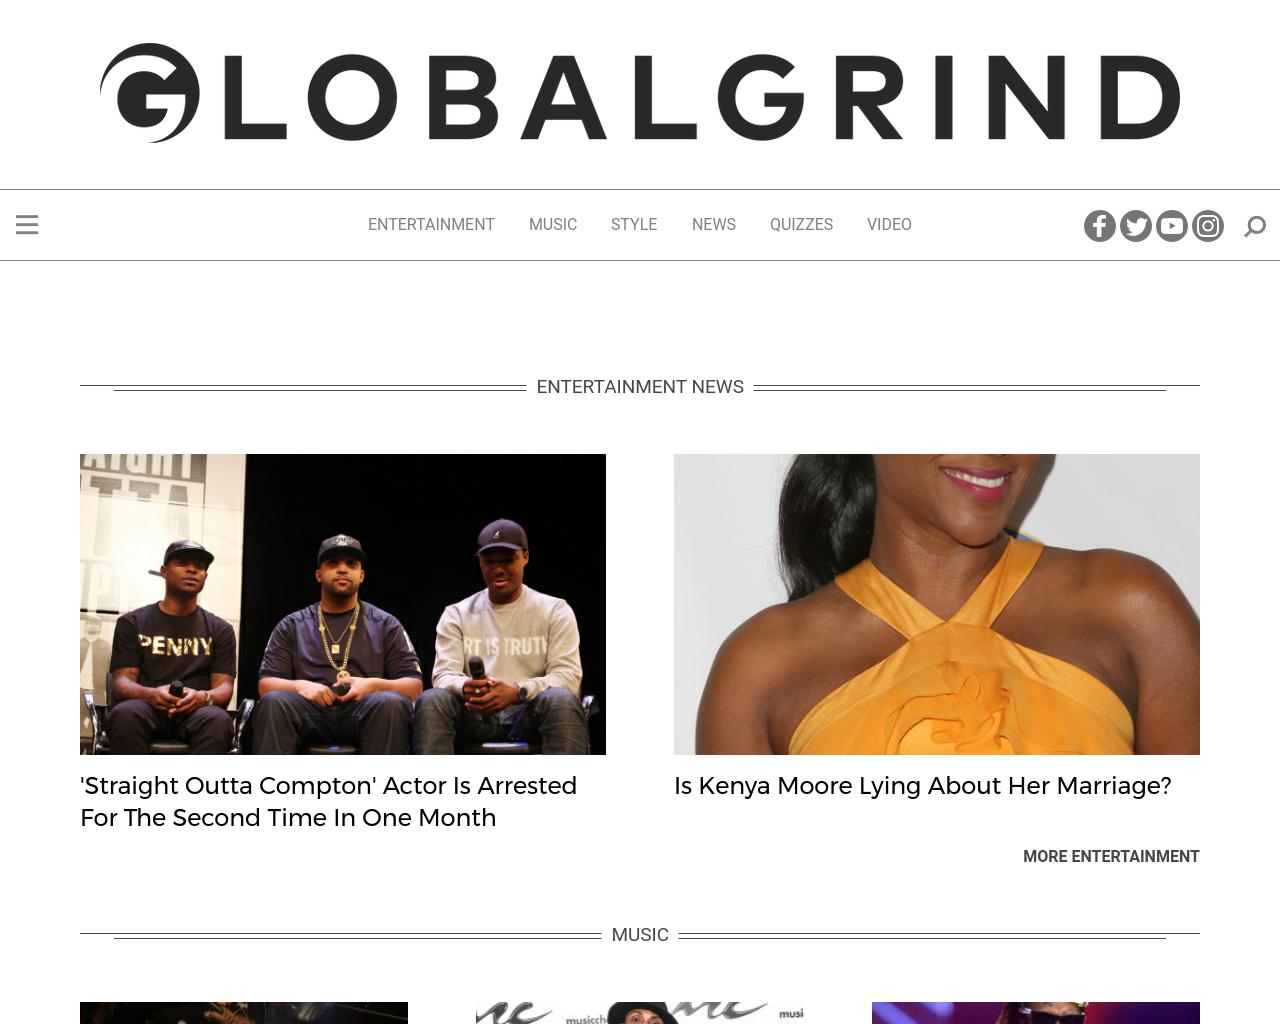 GlobalGrind-Advertising-Reviews-Pricing